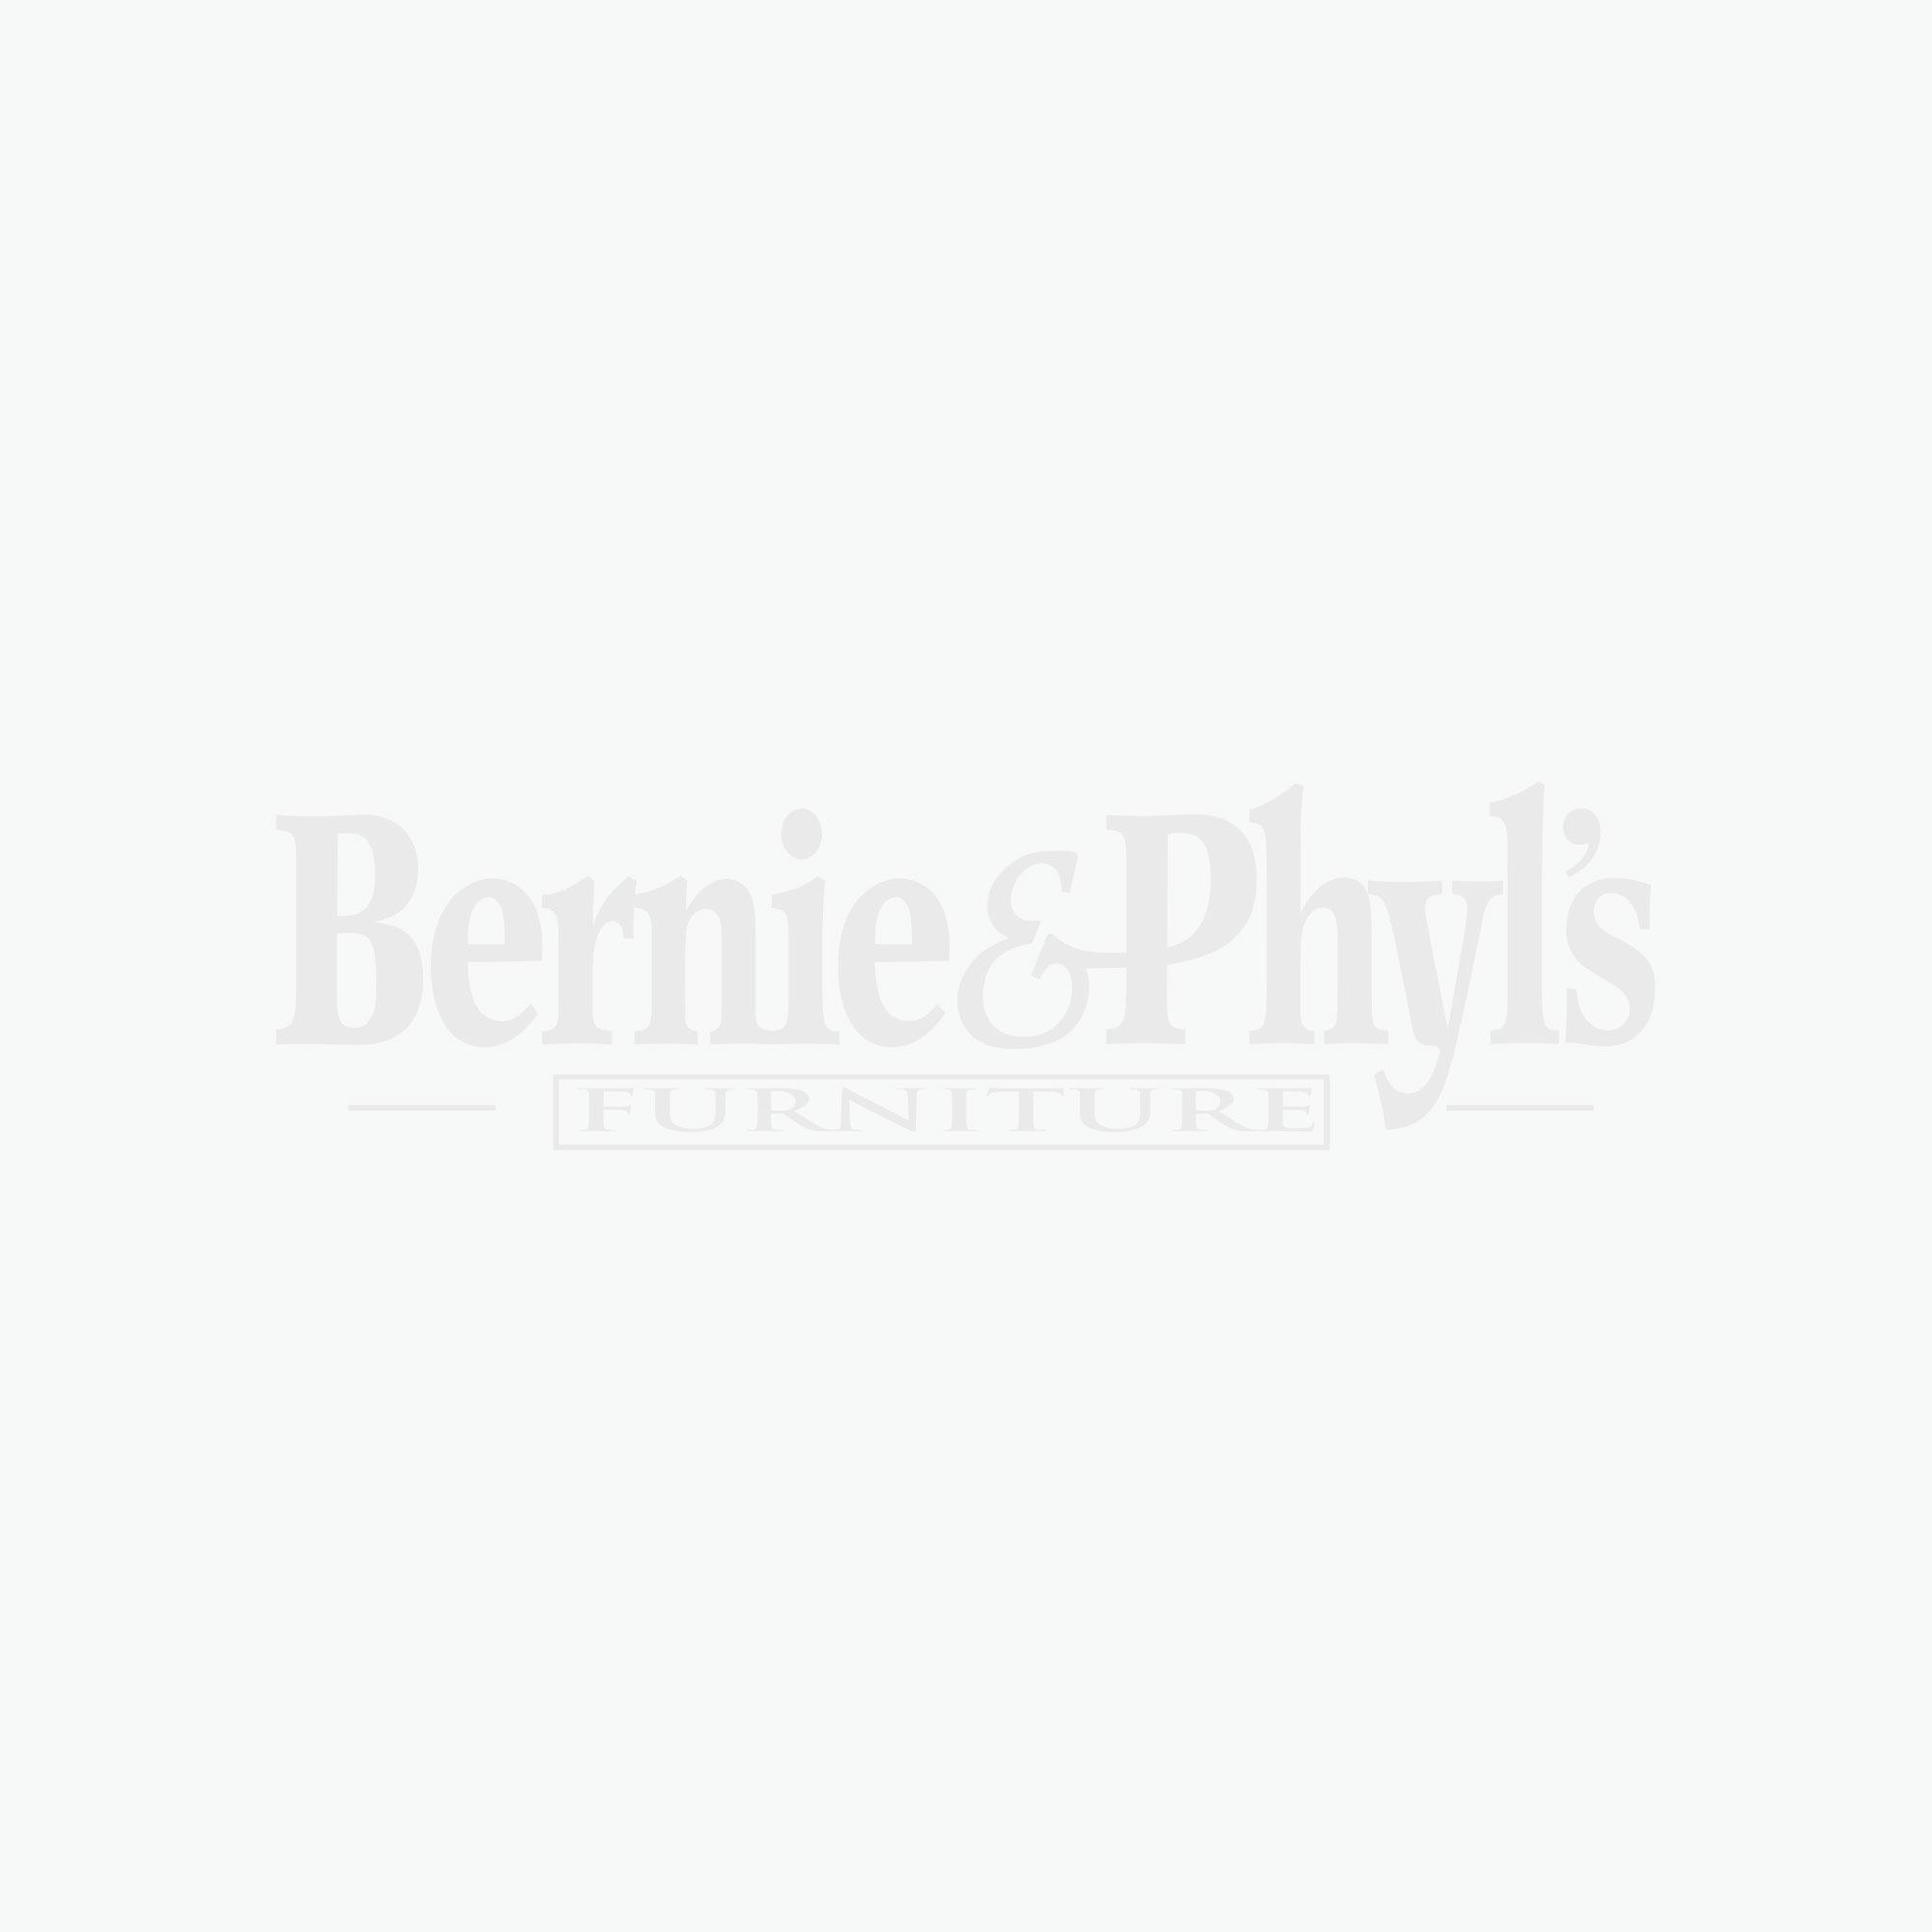 Leander Queen Duvet Cover Set - Turquoise - (Set of 1) - Q720003Q by Ashley Furniture Signature Design